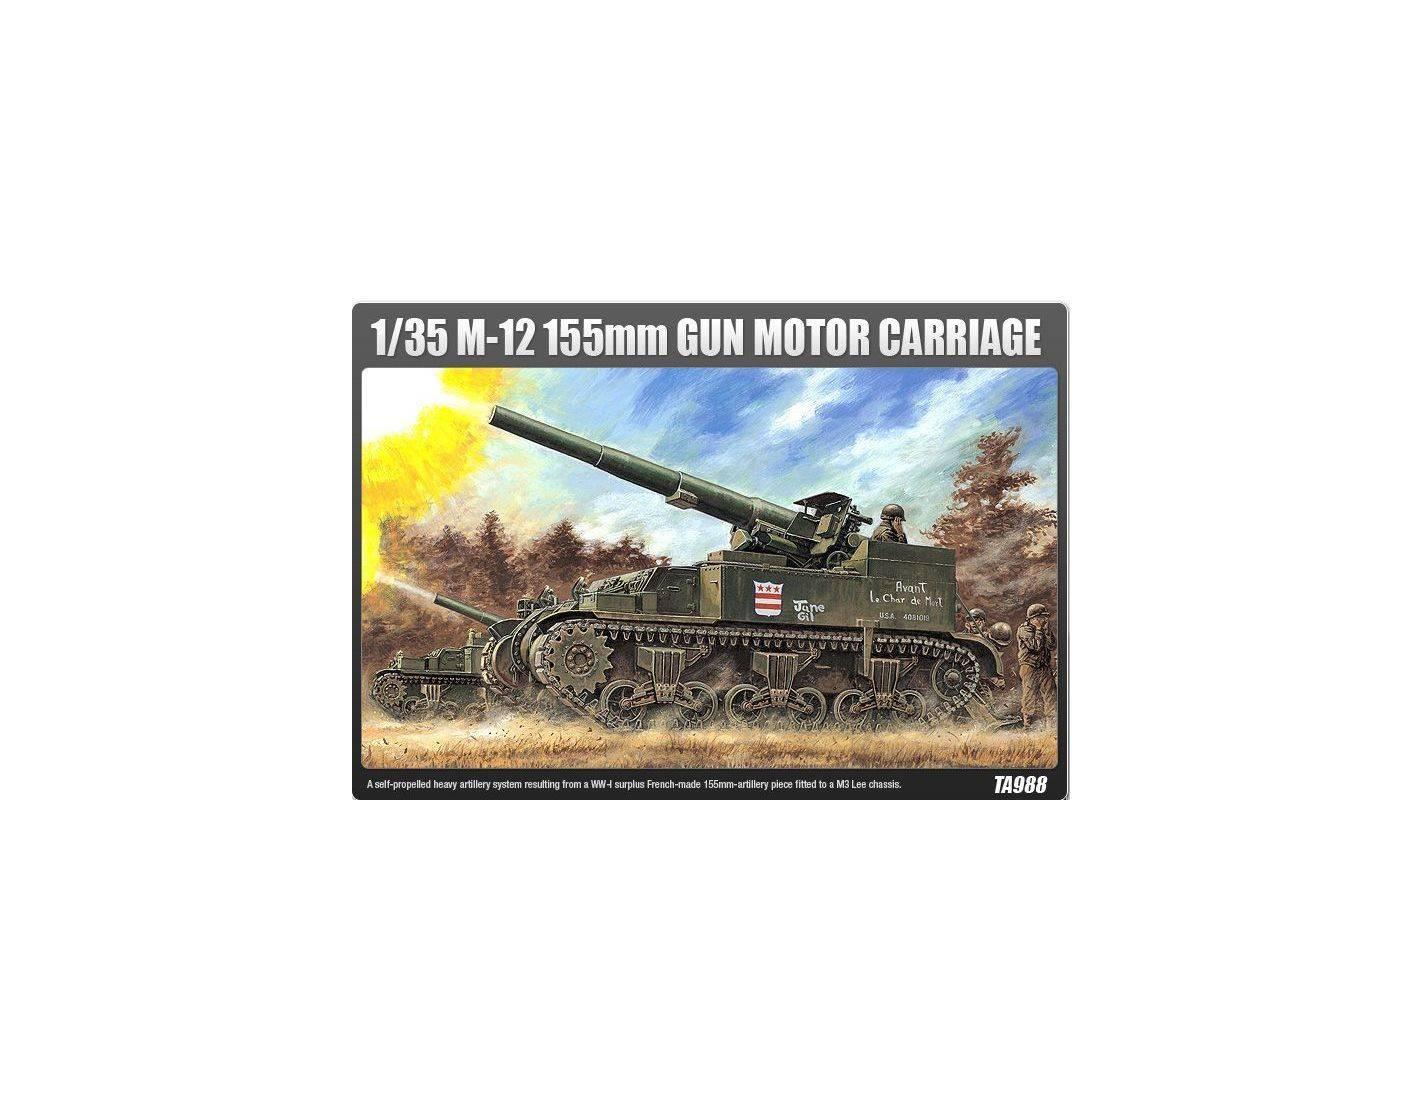 ACADEMY 1394 M-12 155MM GUN MOTOR CARRIAGE 1:35 Kit Modellino